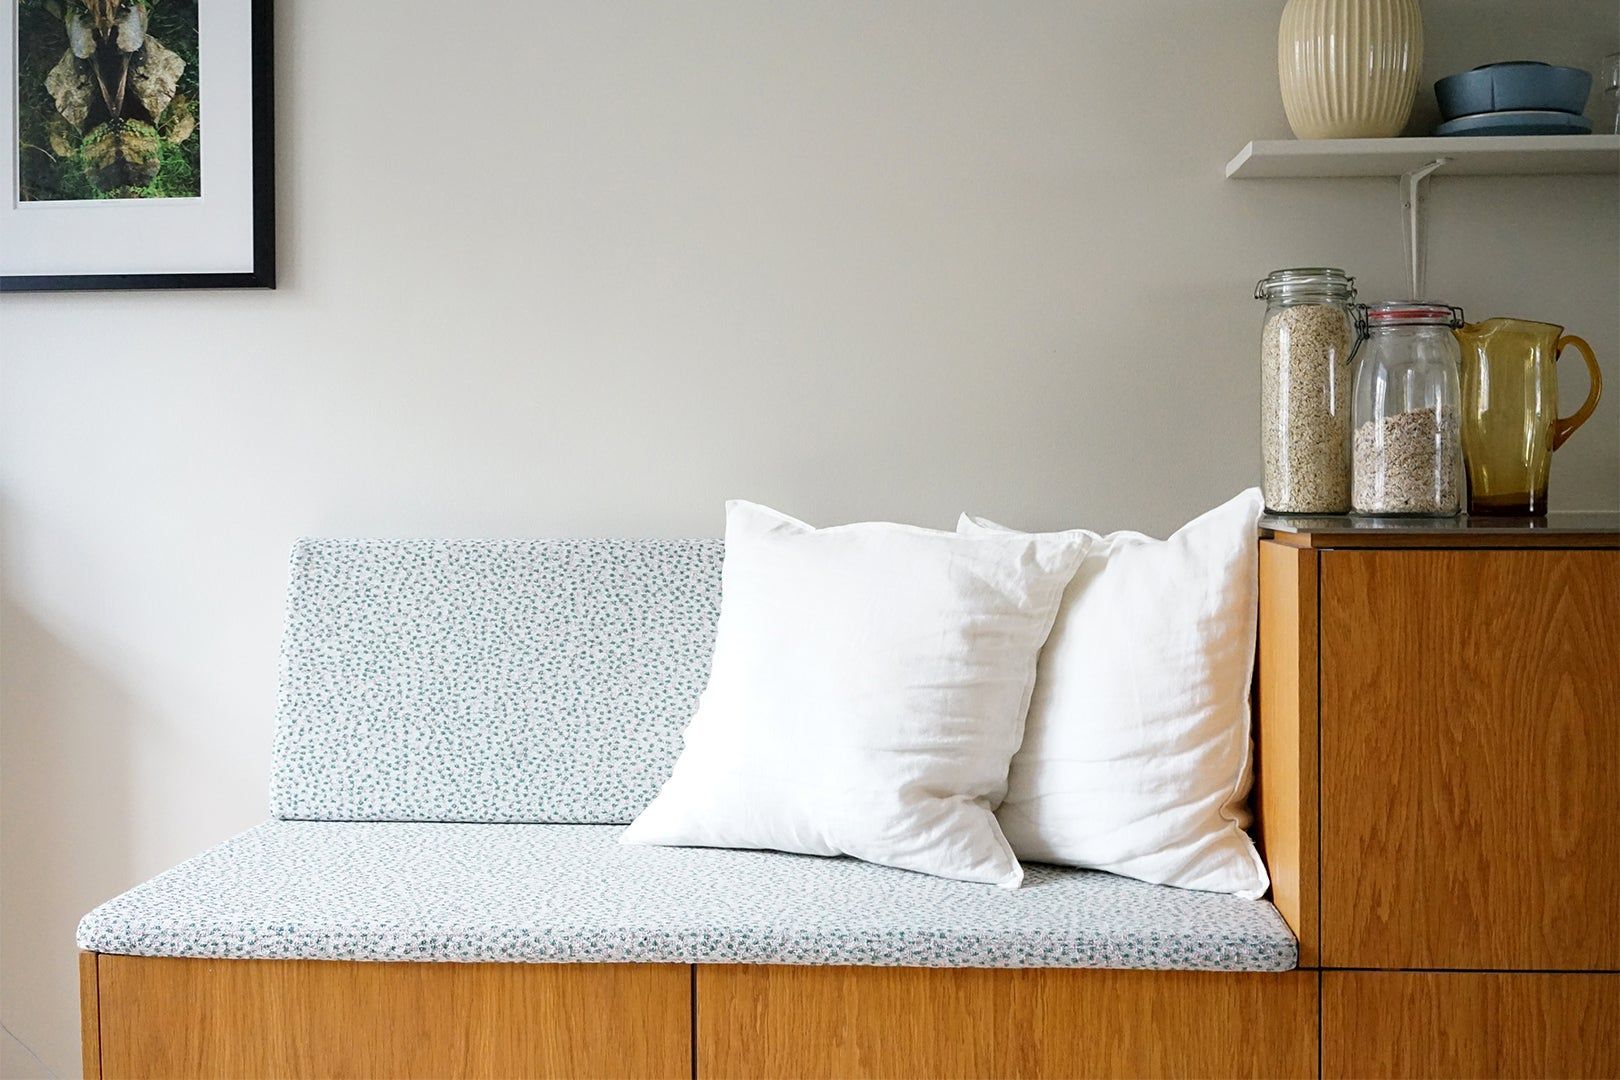 cushion on bench